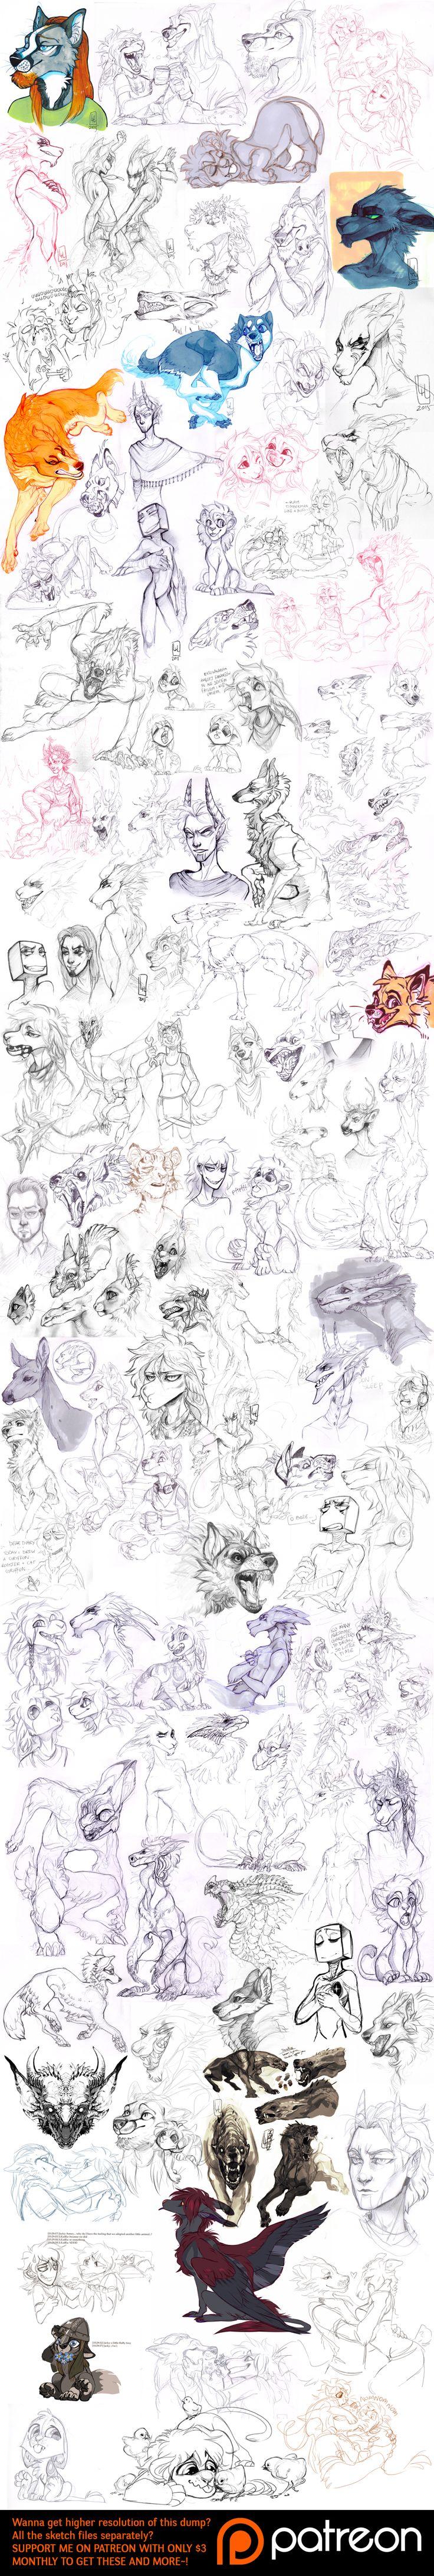 Sketch dump 60 by LiLaiRa on DeviantArt